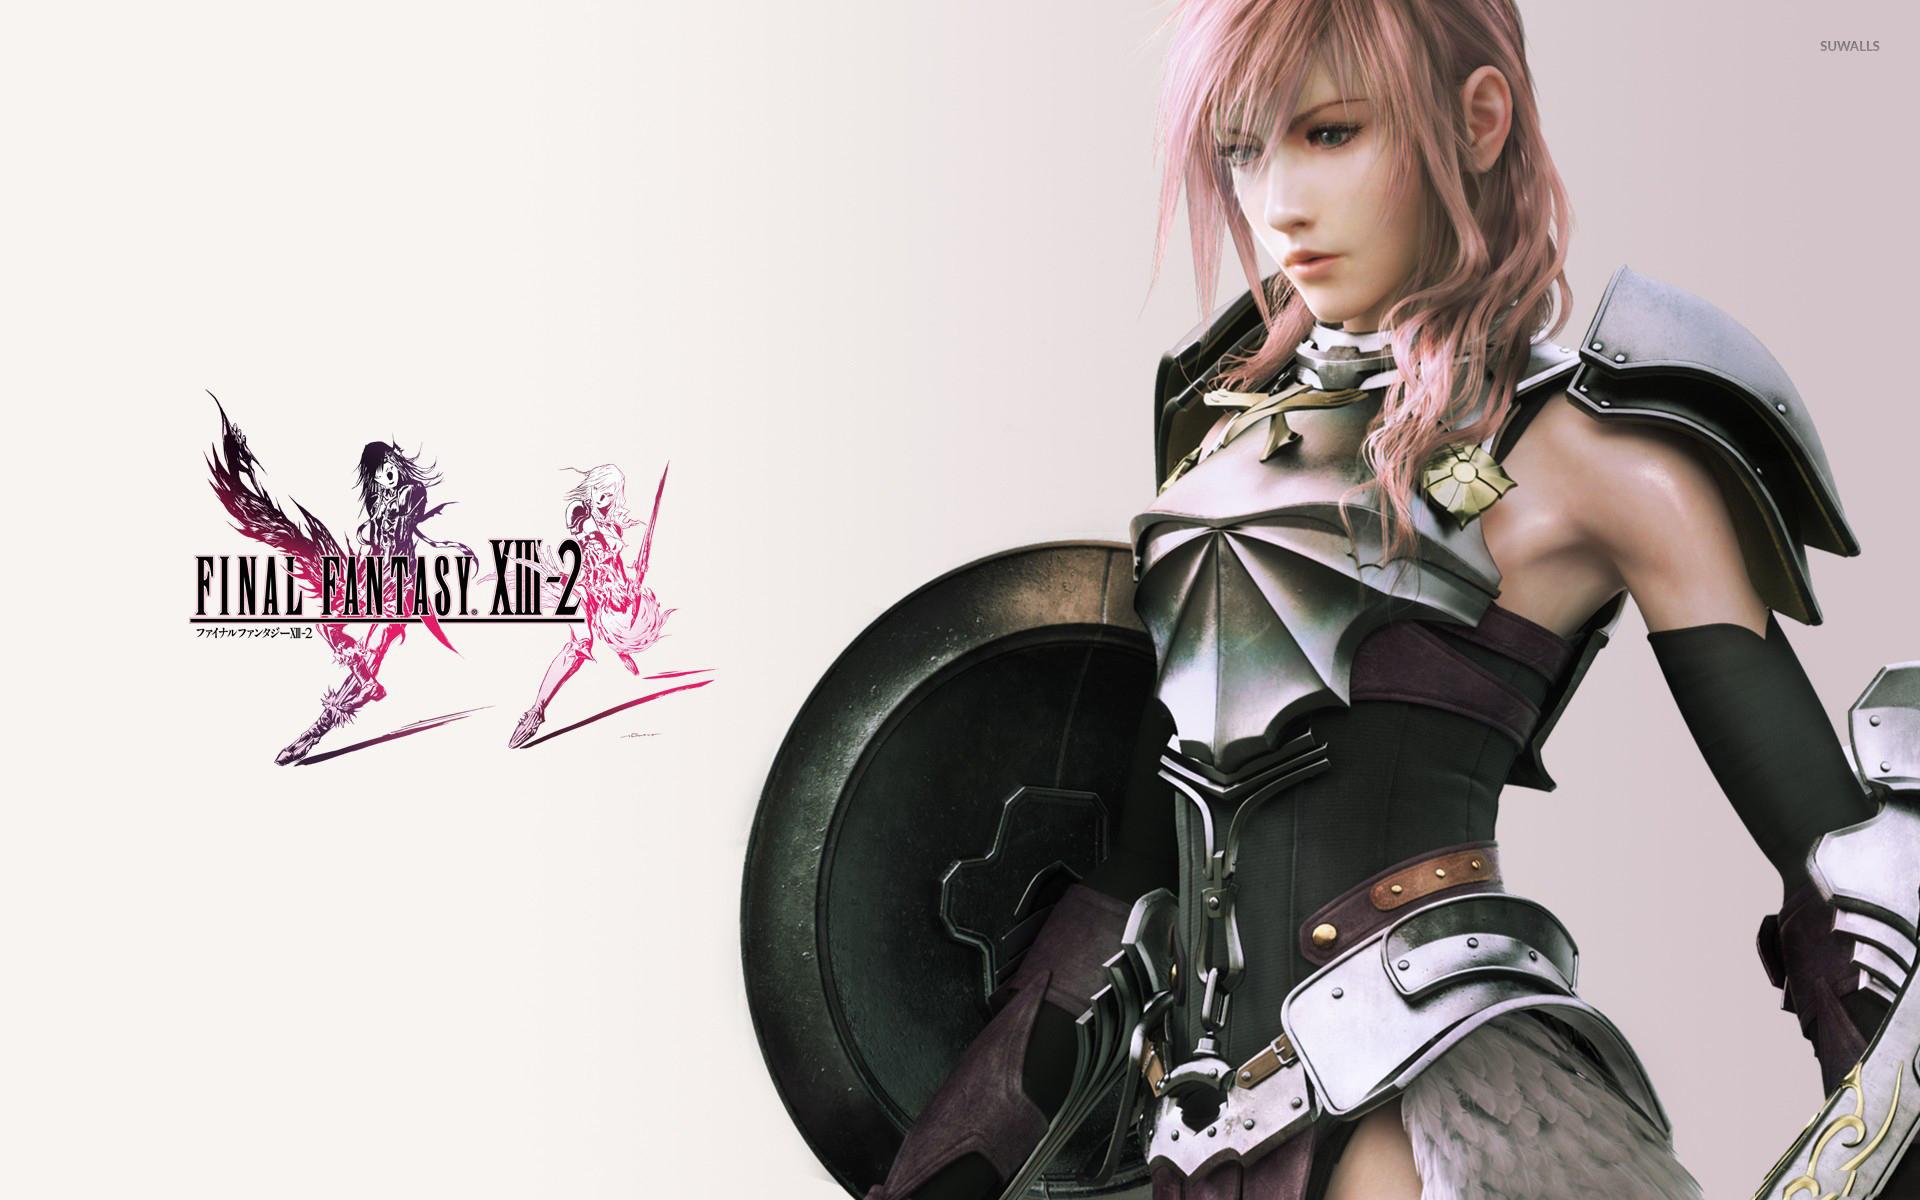 Res: 1920x1200, Serah Farron - Final Fantasy XIII-2 [4] wallpaper  jpg